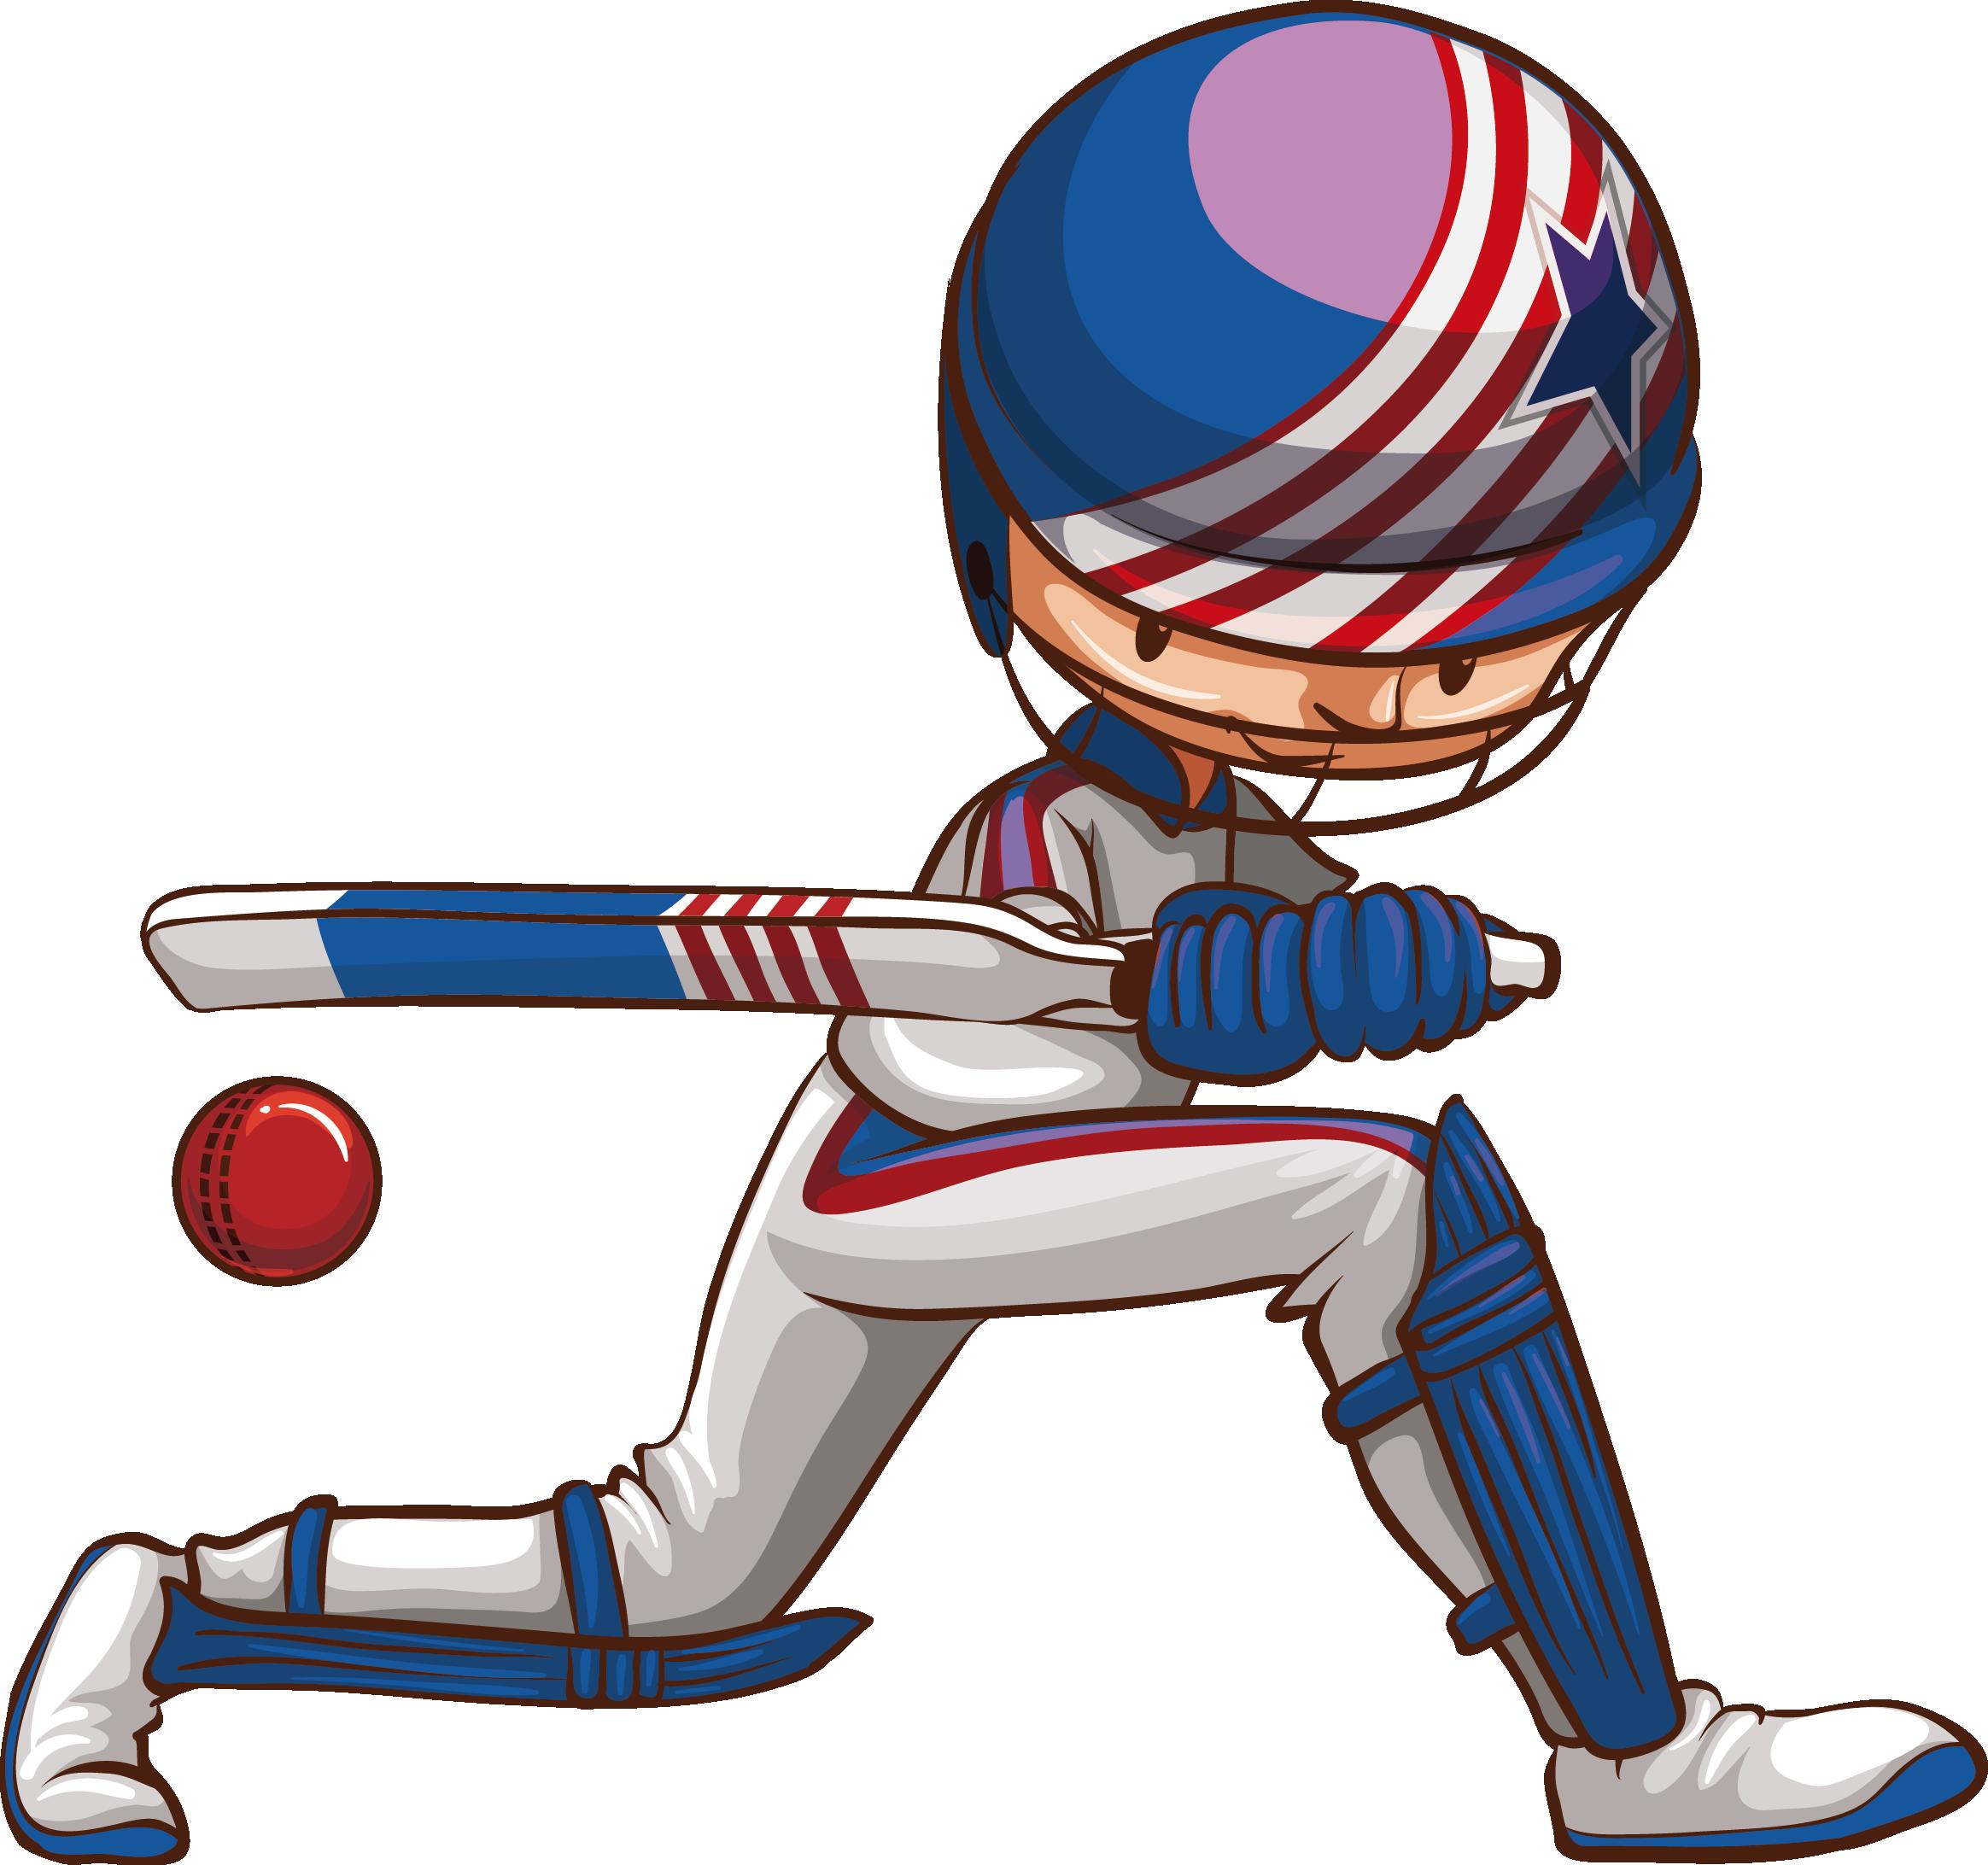 clip art freeuse Cricket drawing royalty free. Baseball clip practice